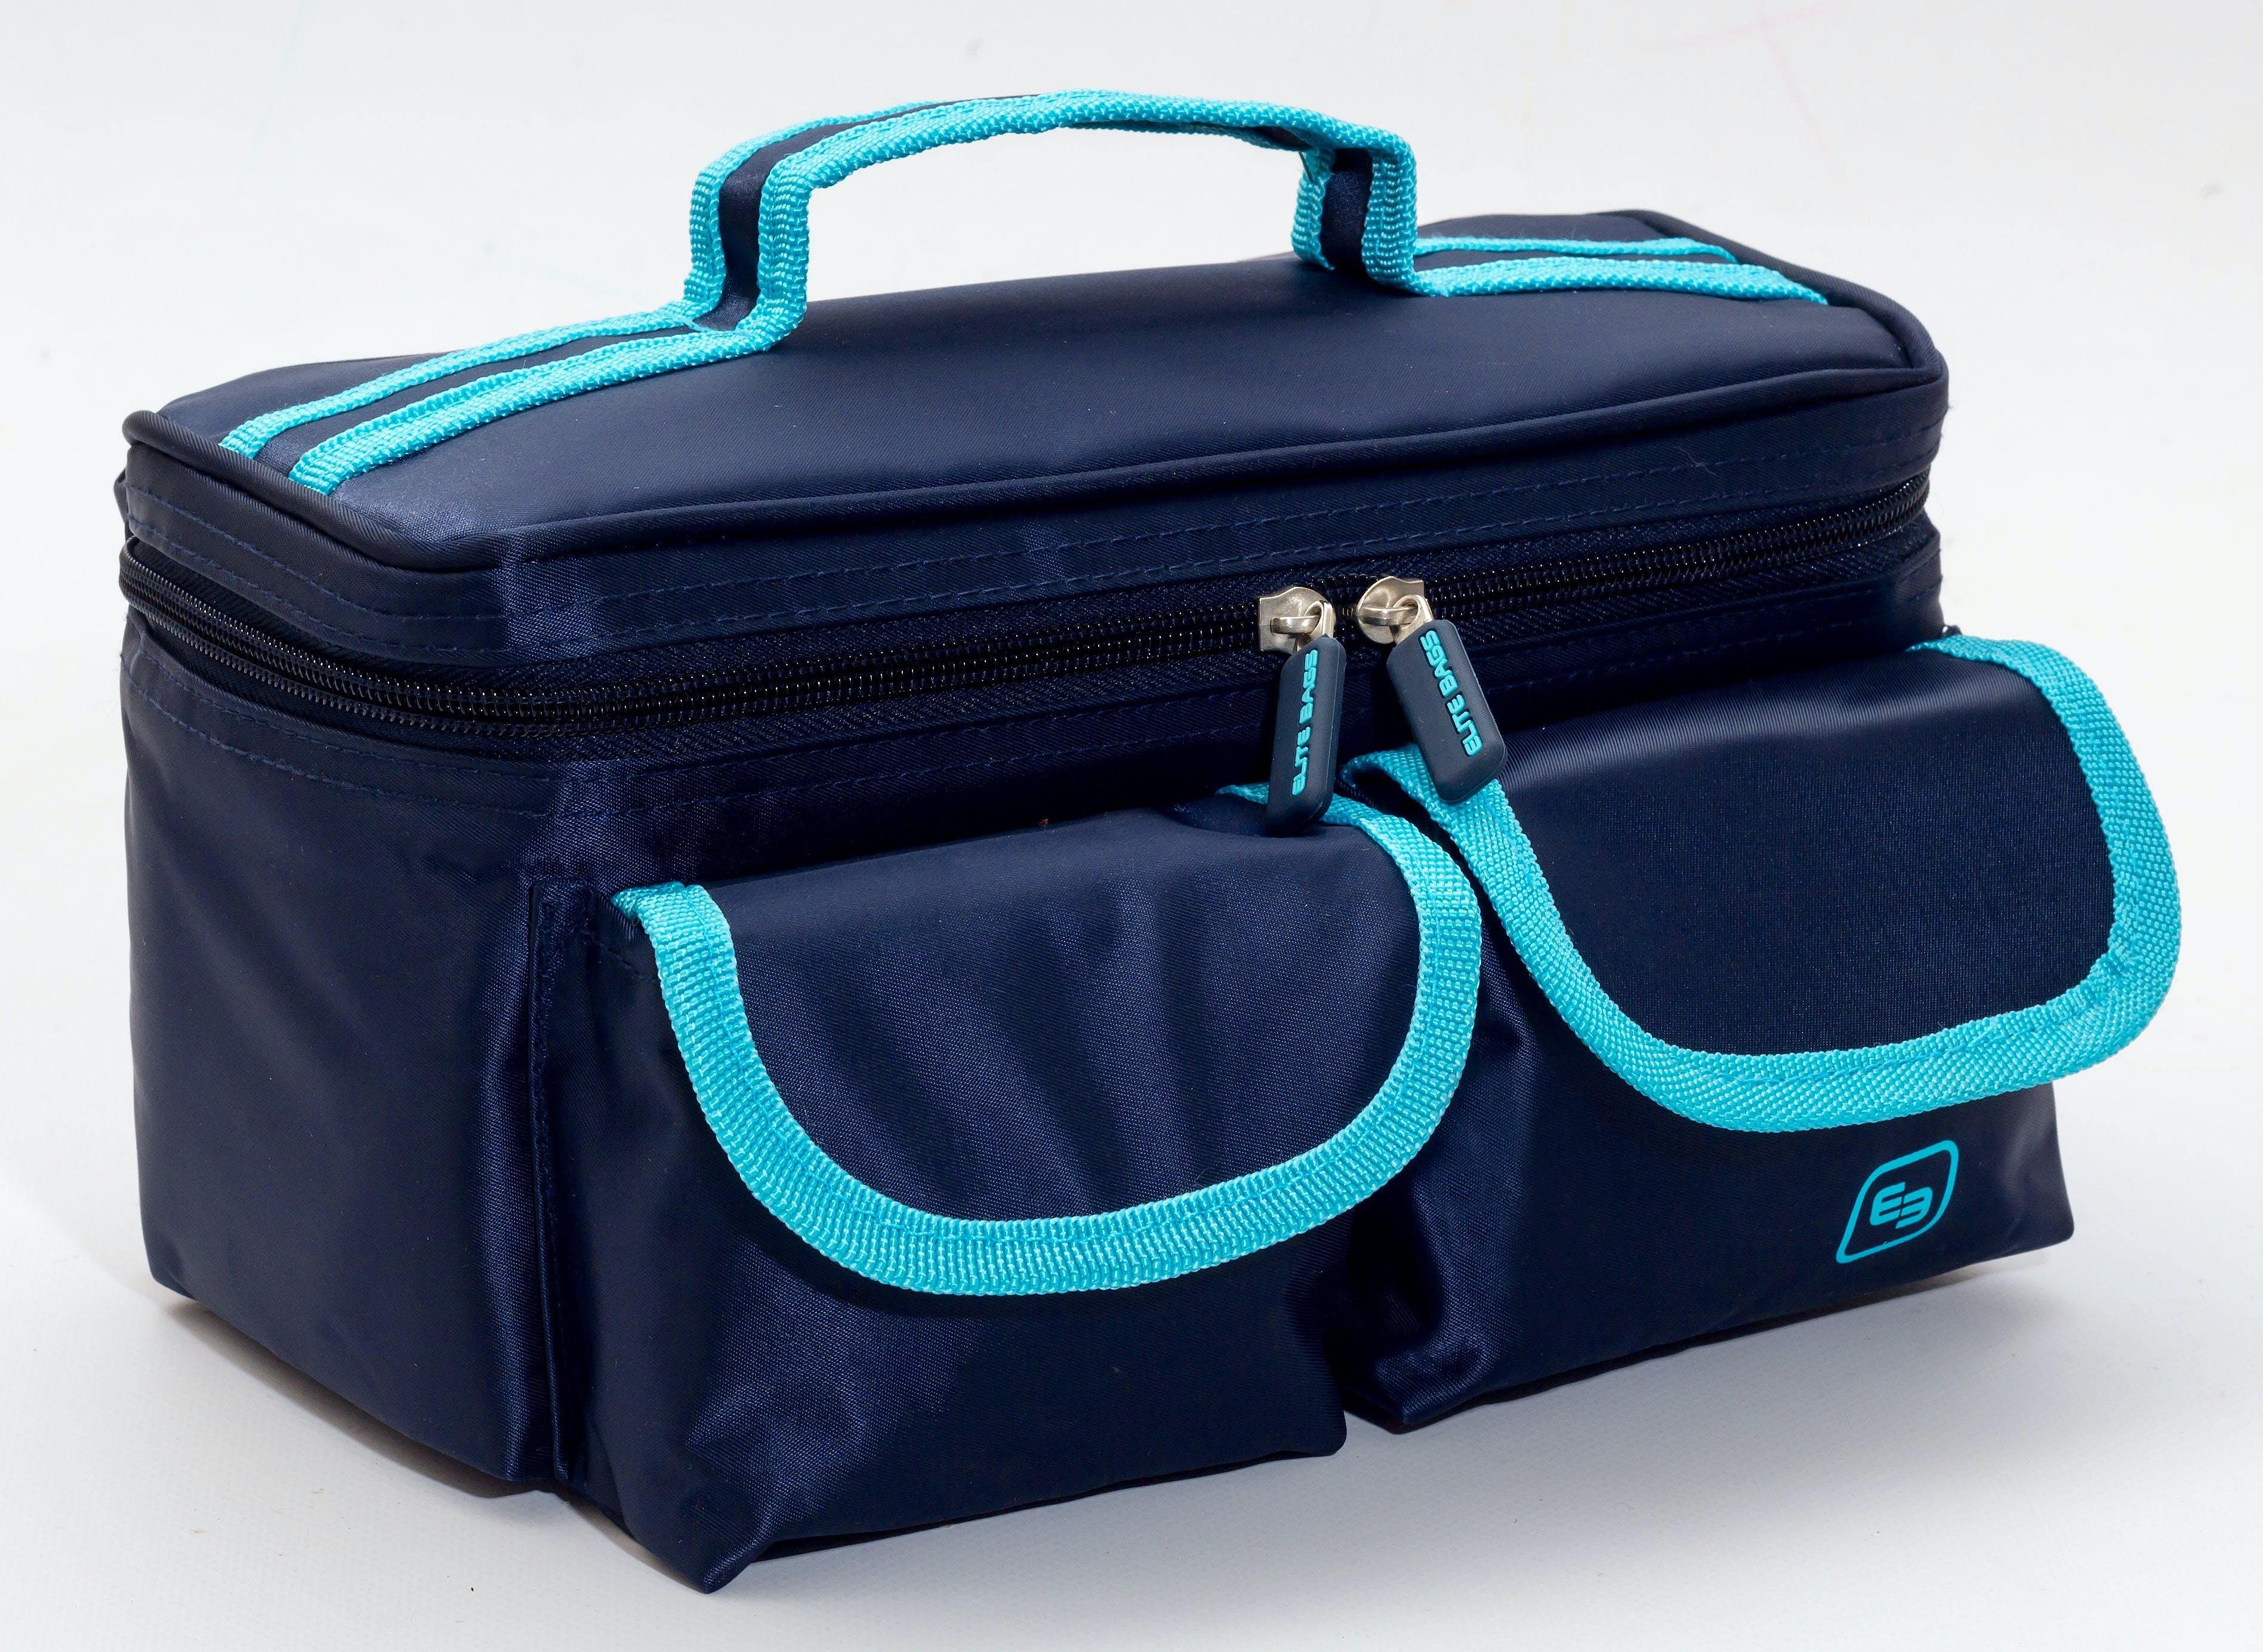 Gradilla Isotérmica para Transporte de Muestras Modelo ROW'S EB04.002. Sarga, Color Azul Marino